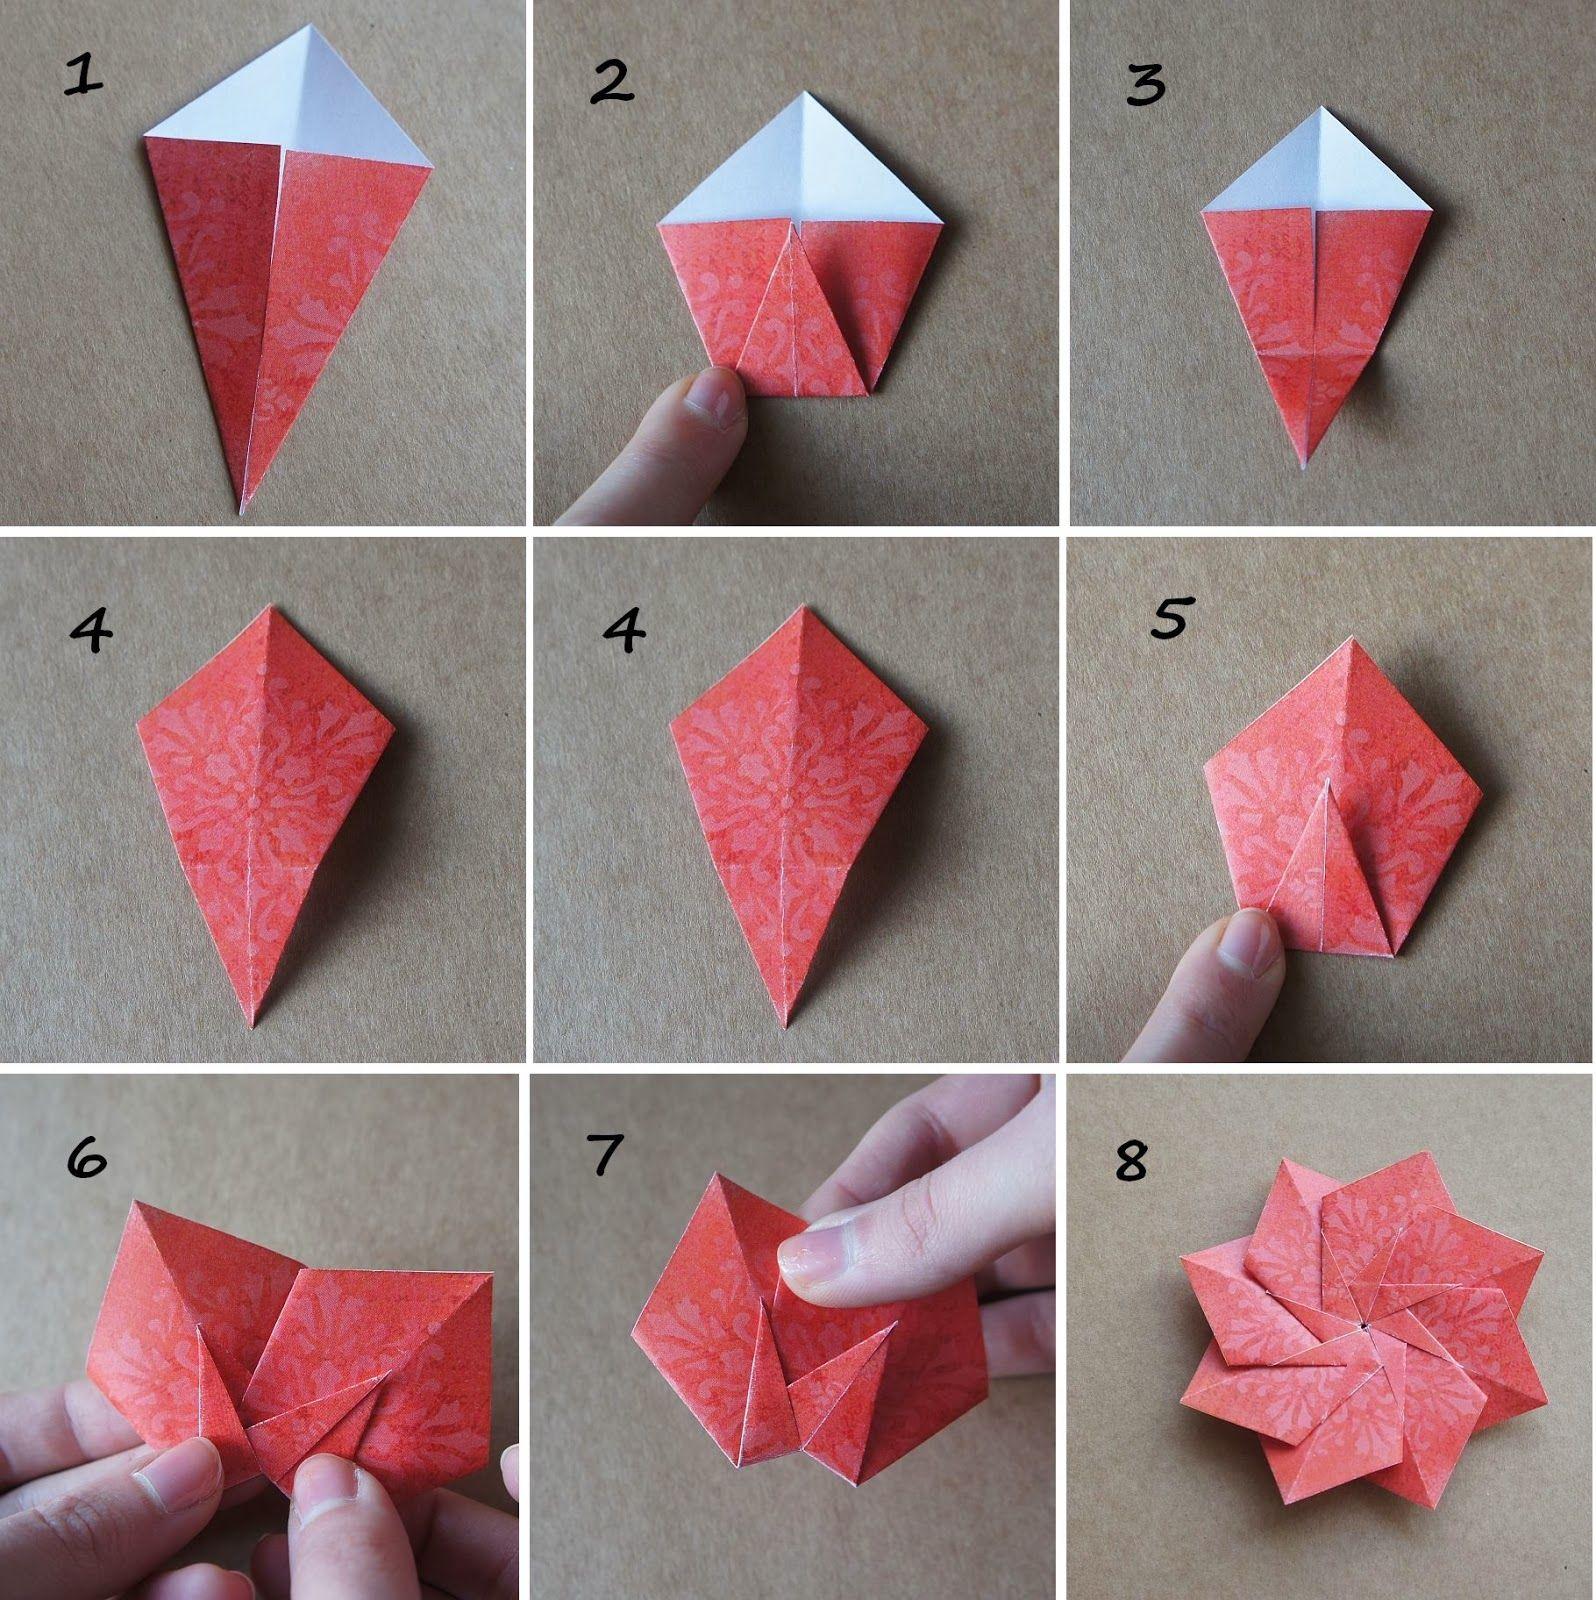 Origami 8 Petal Flower G Pinterest Origami Origami 8